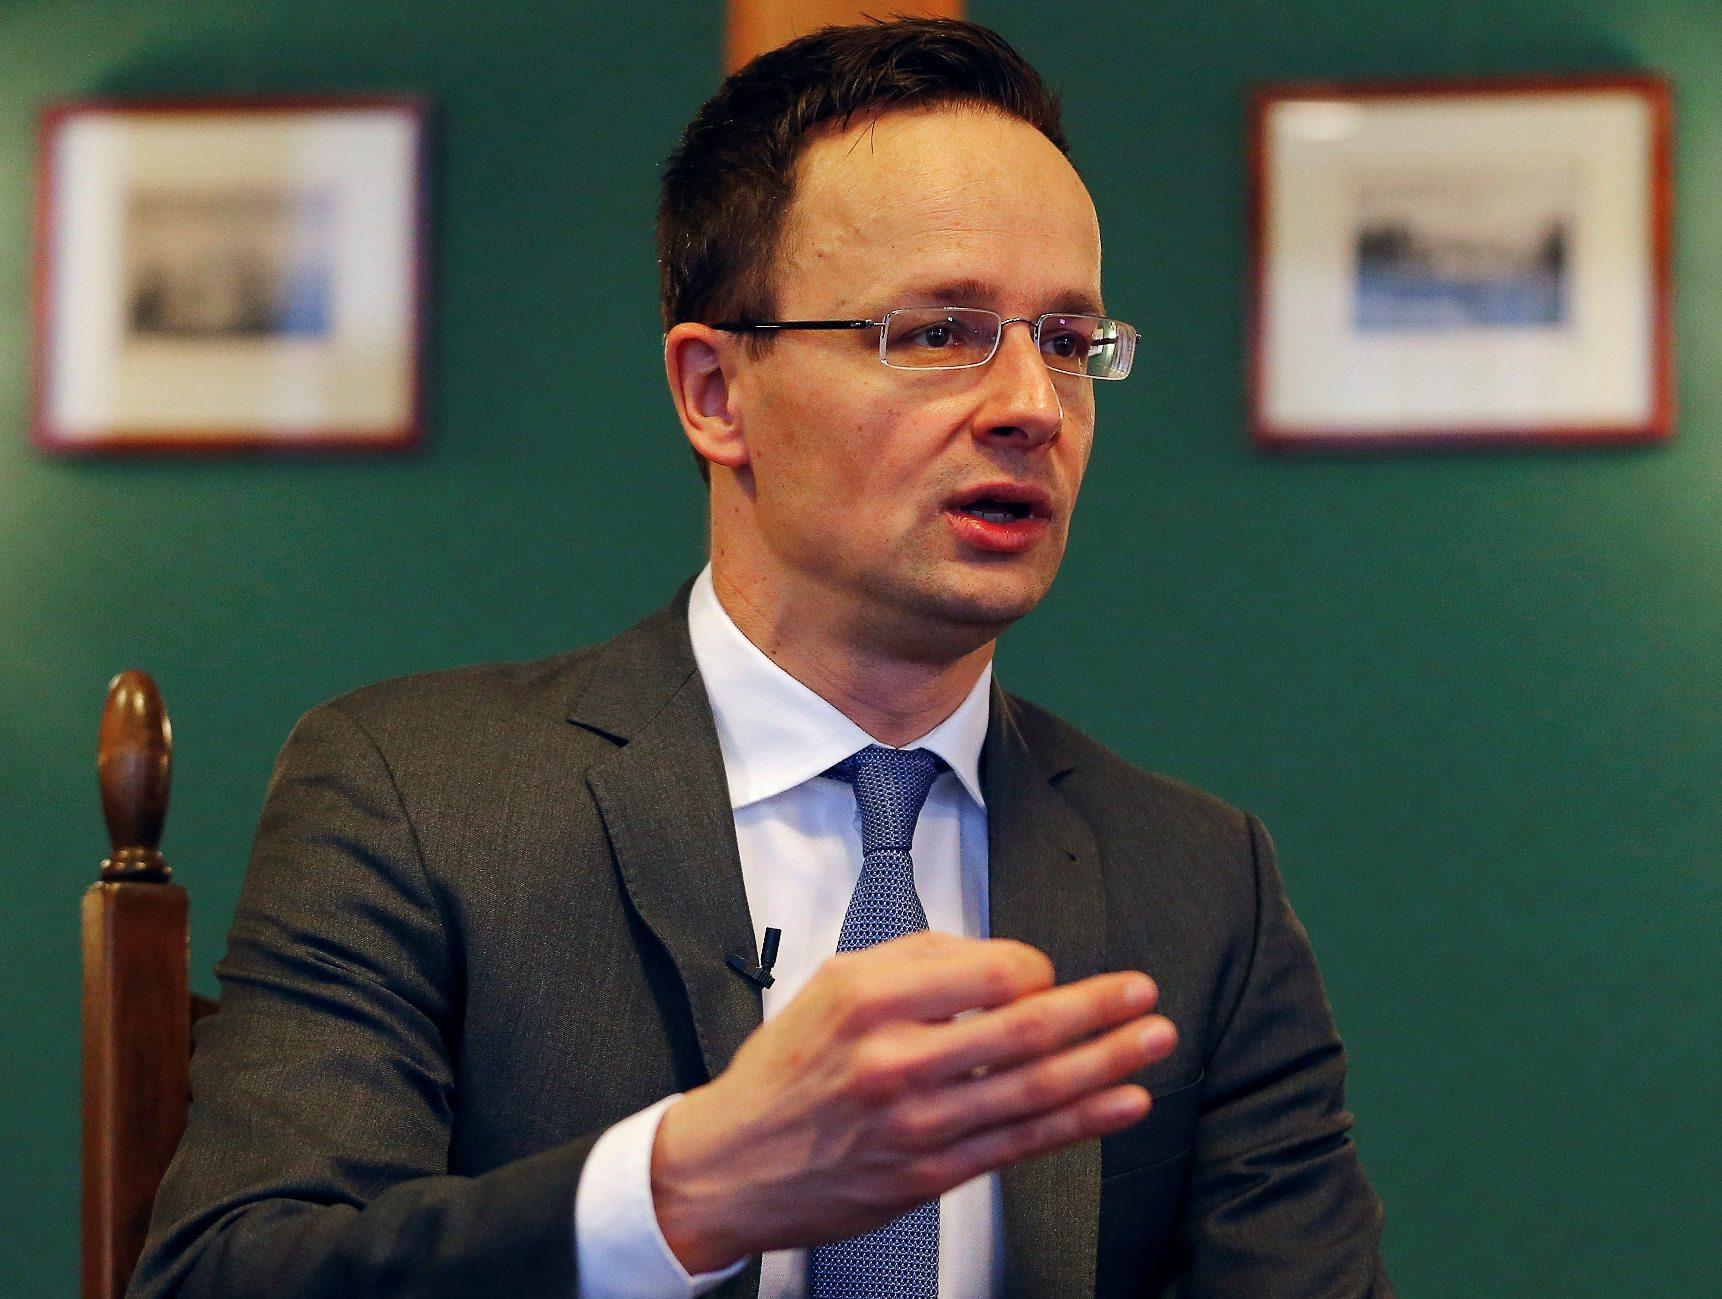 Mađarski ministar vanjskih poslova Peter Szijjarto